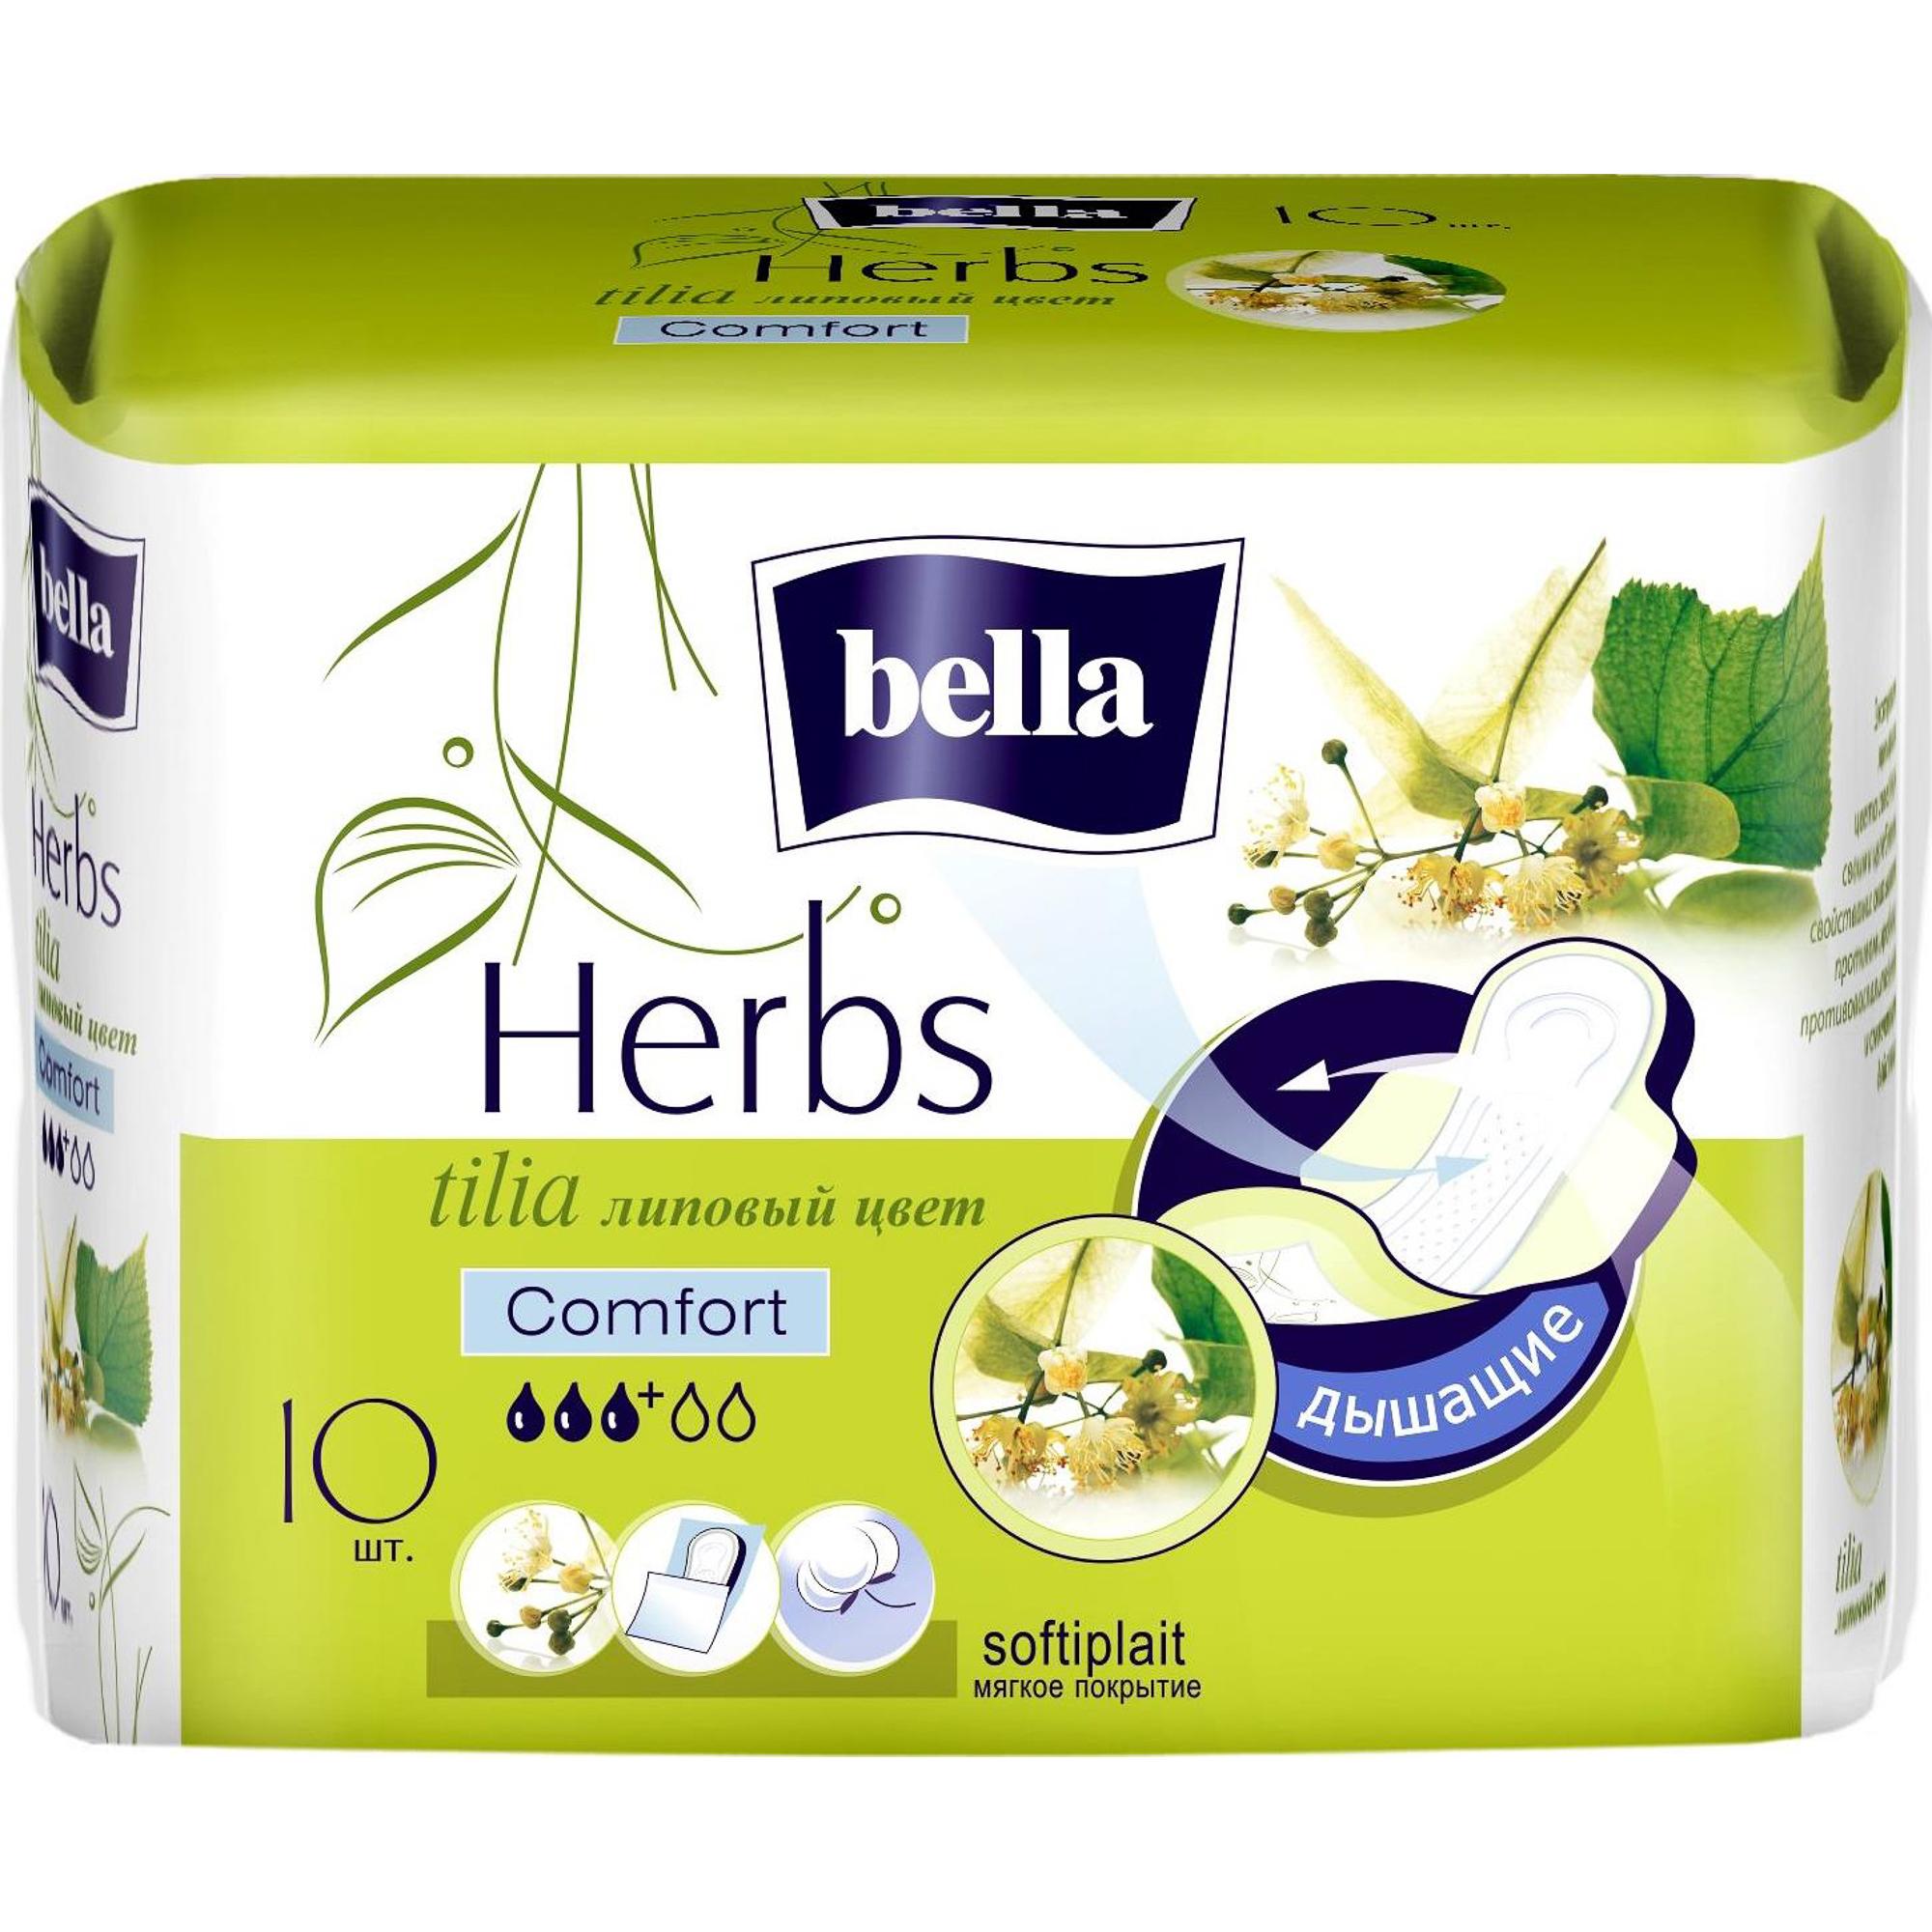 Прокладки Bella Herbs Comfort Tilia 10 шт.